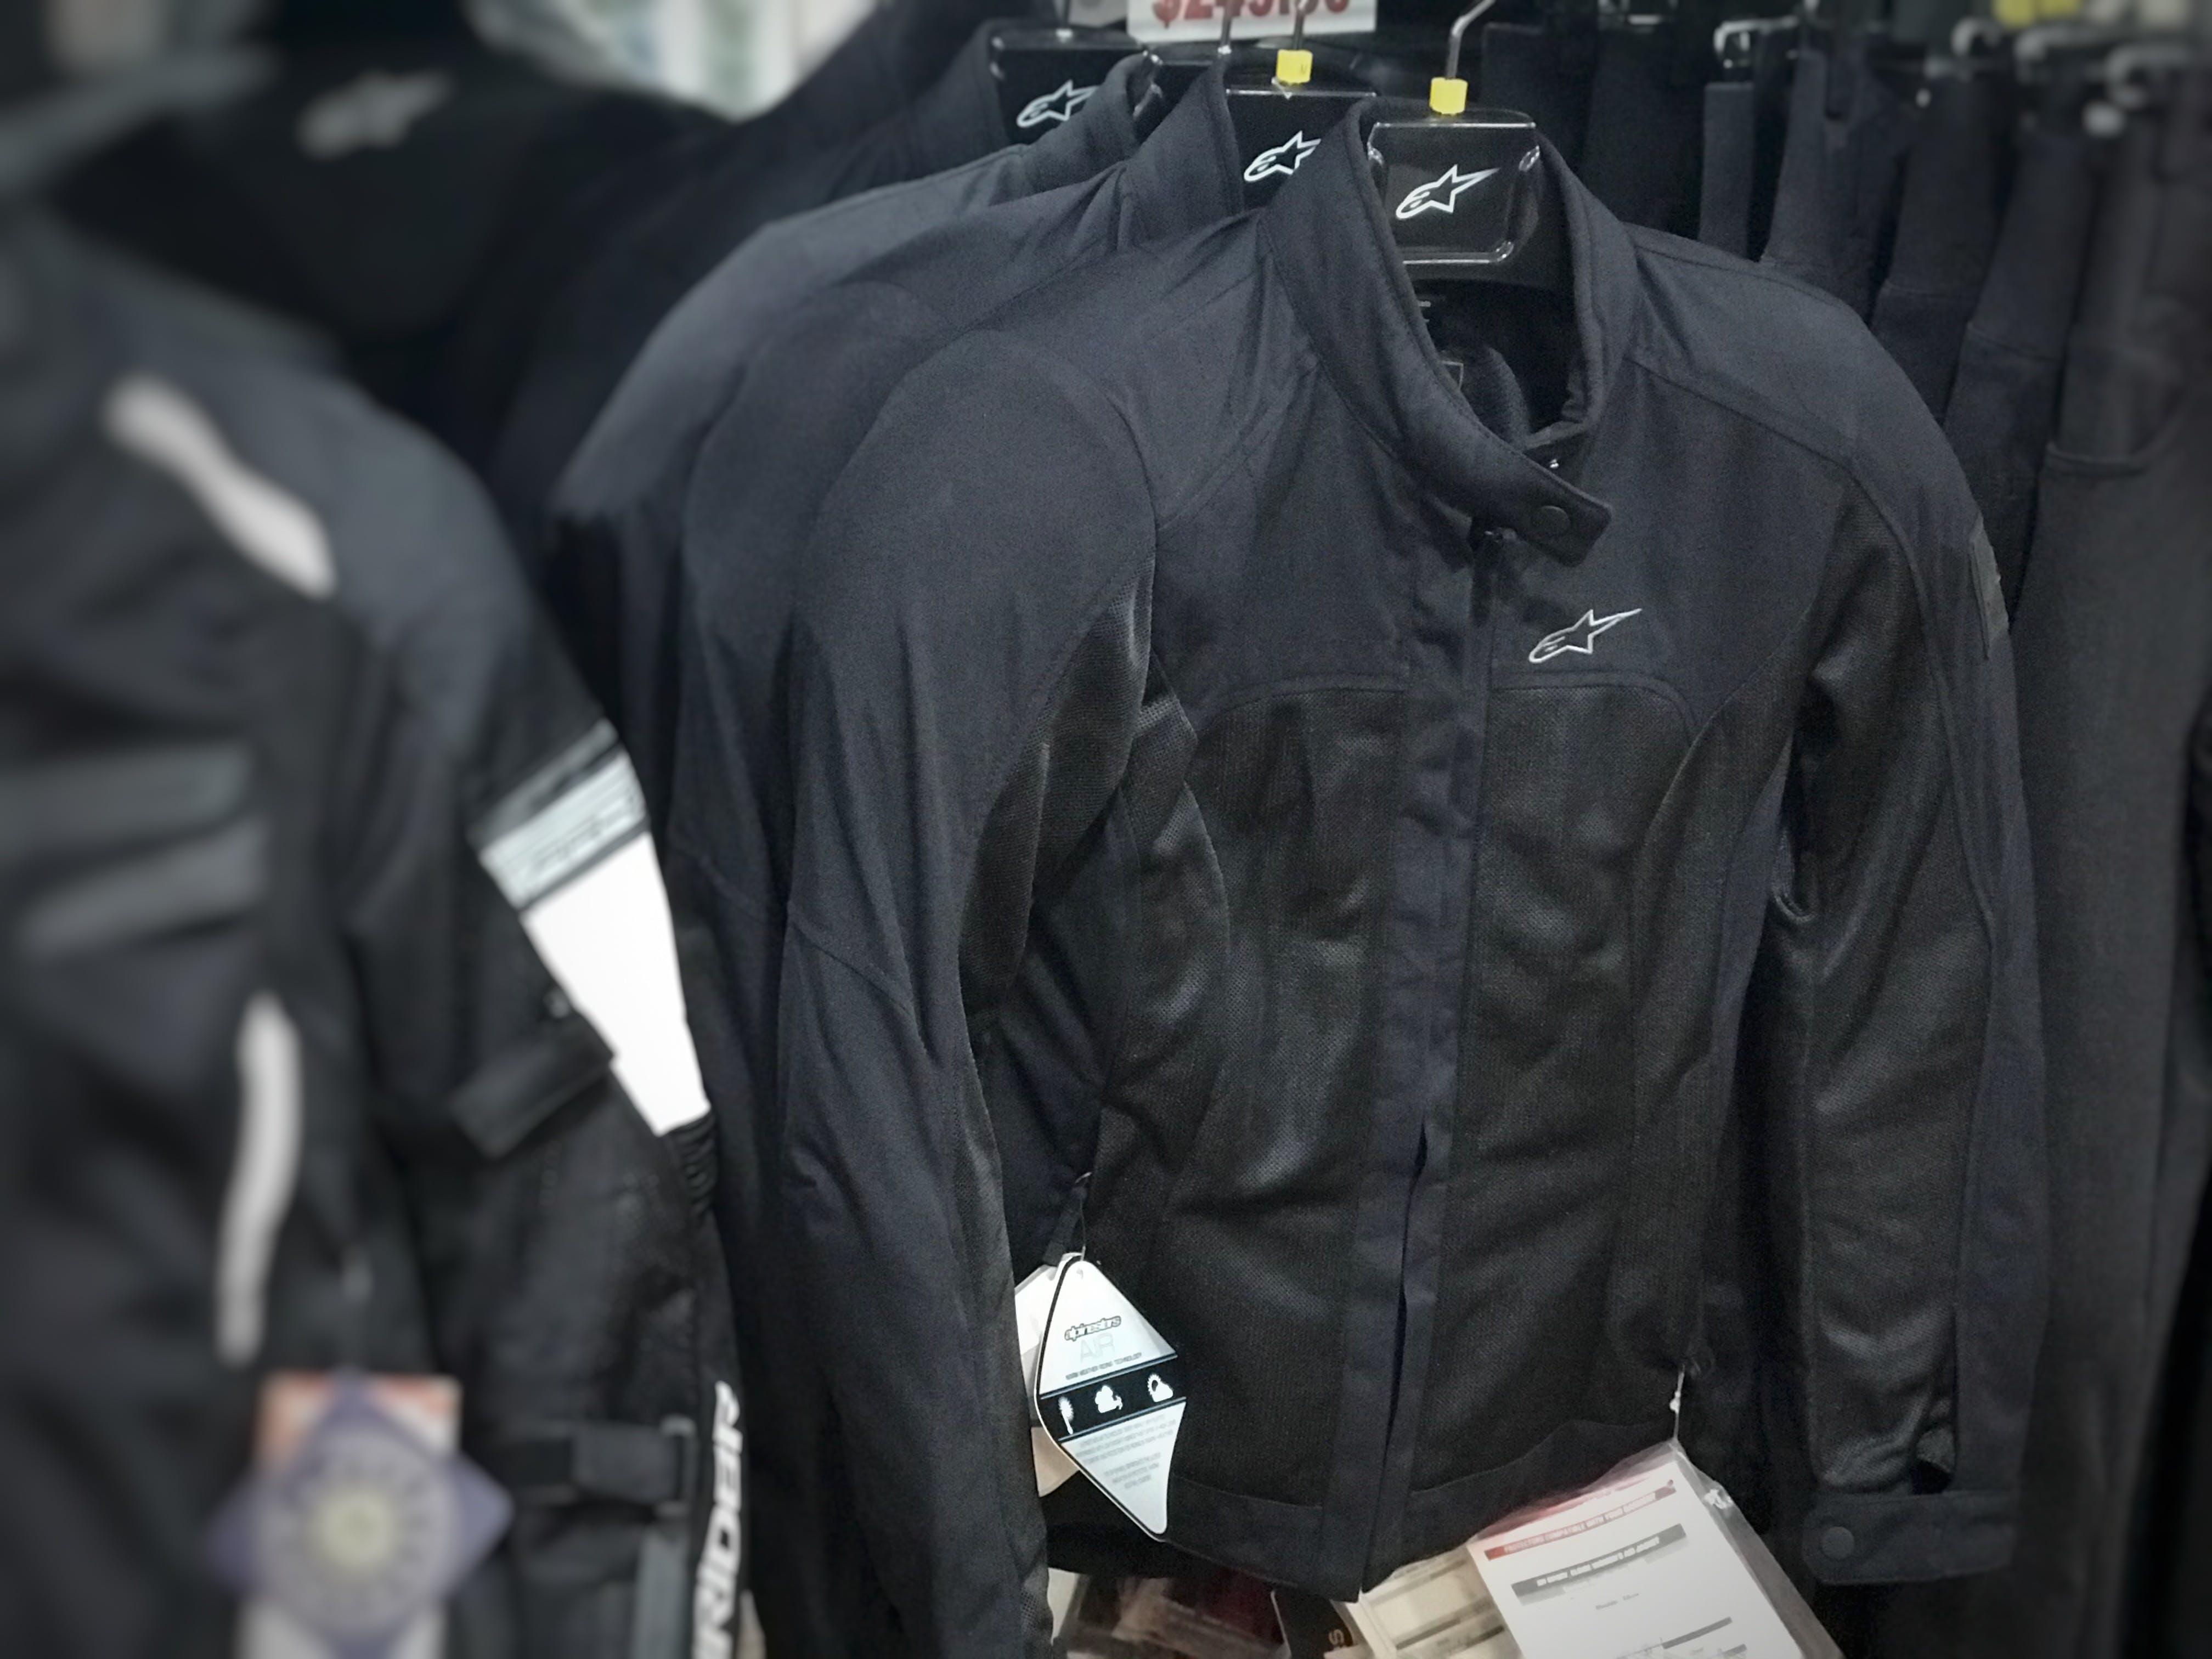 The Stella Eloise jacket in store at Bikebiz in black